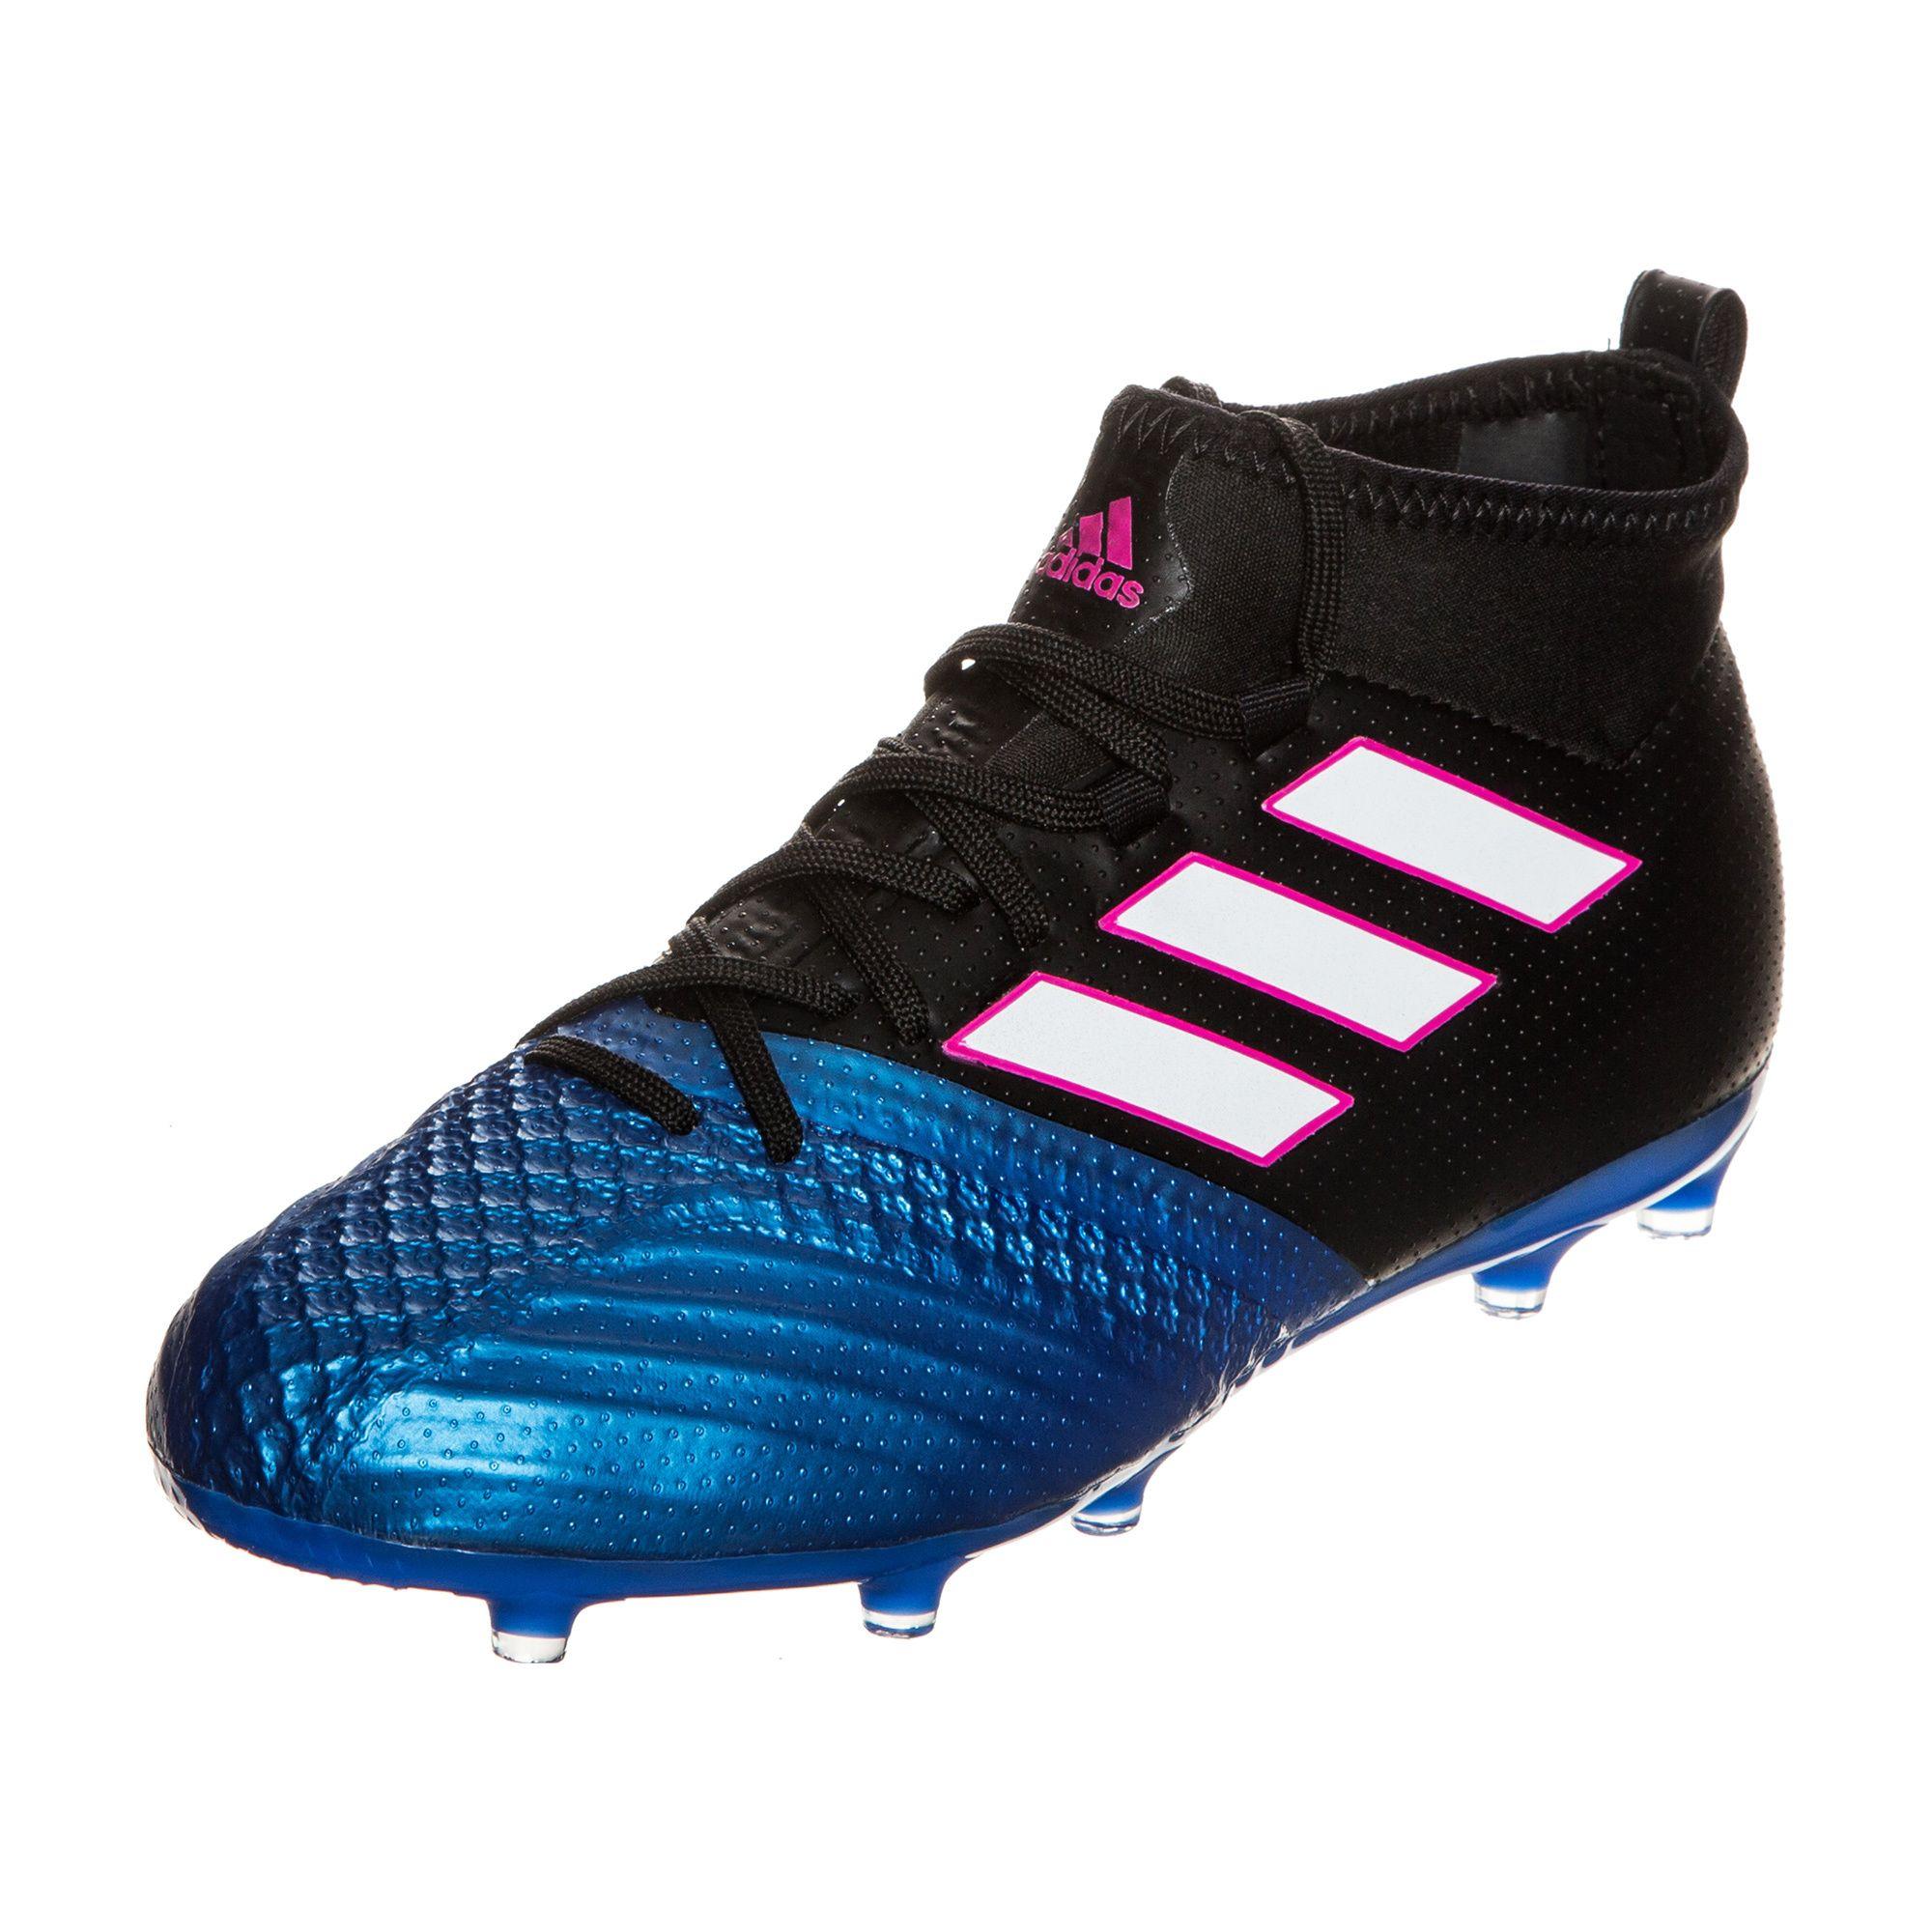 ADIDAS PERFORMANCE adidas Performance ACE 17.1 FG Fußballschuh Kinder